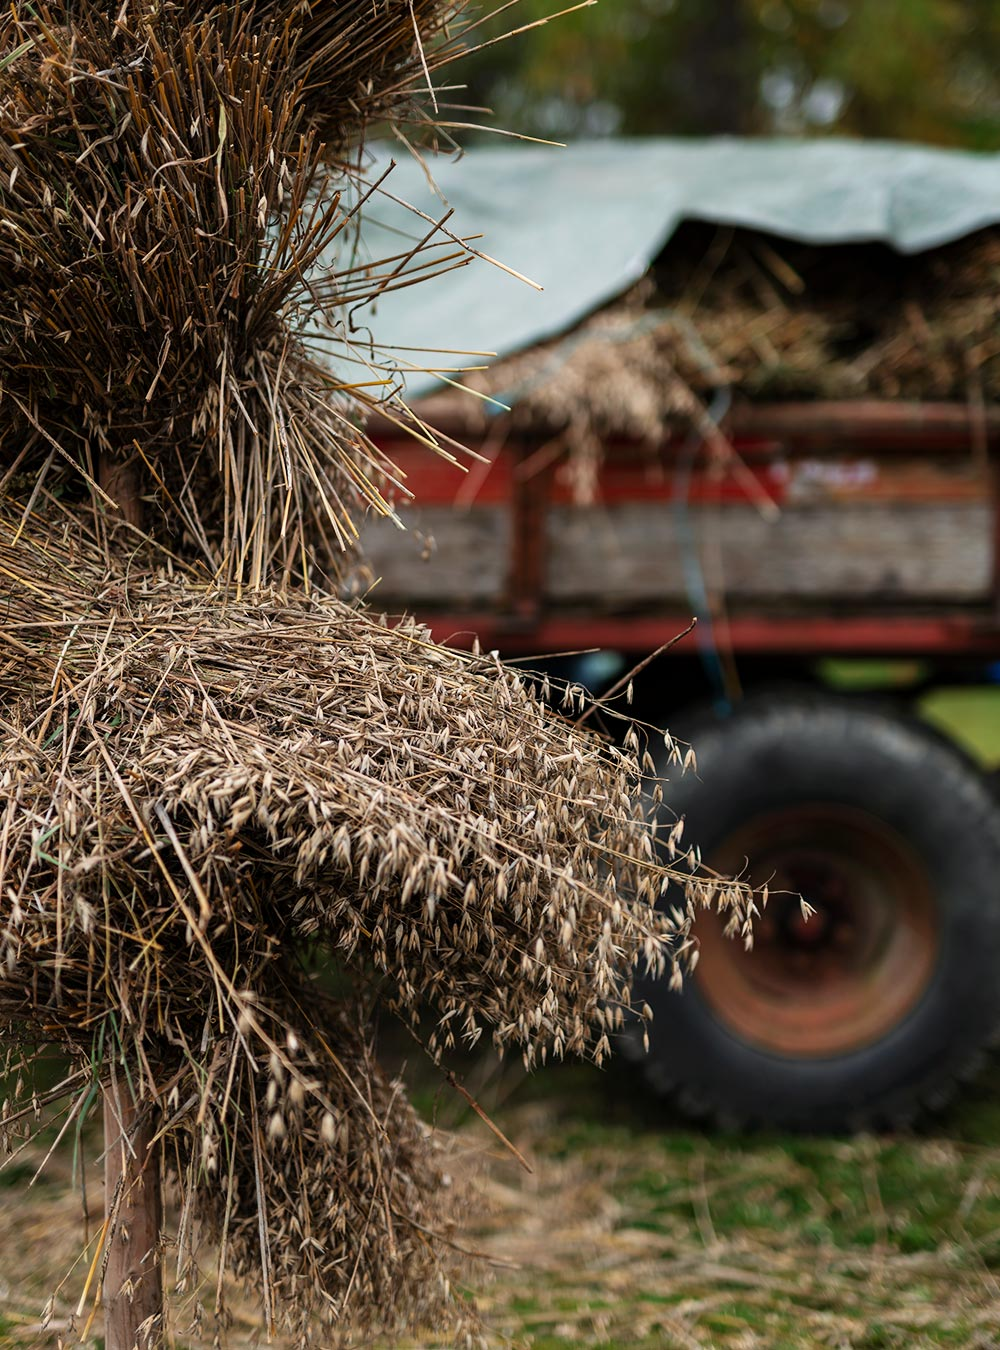 viljaa ja traktorin peräkärry